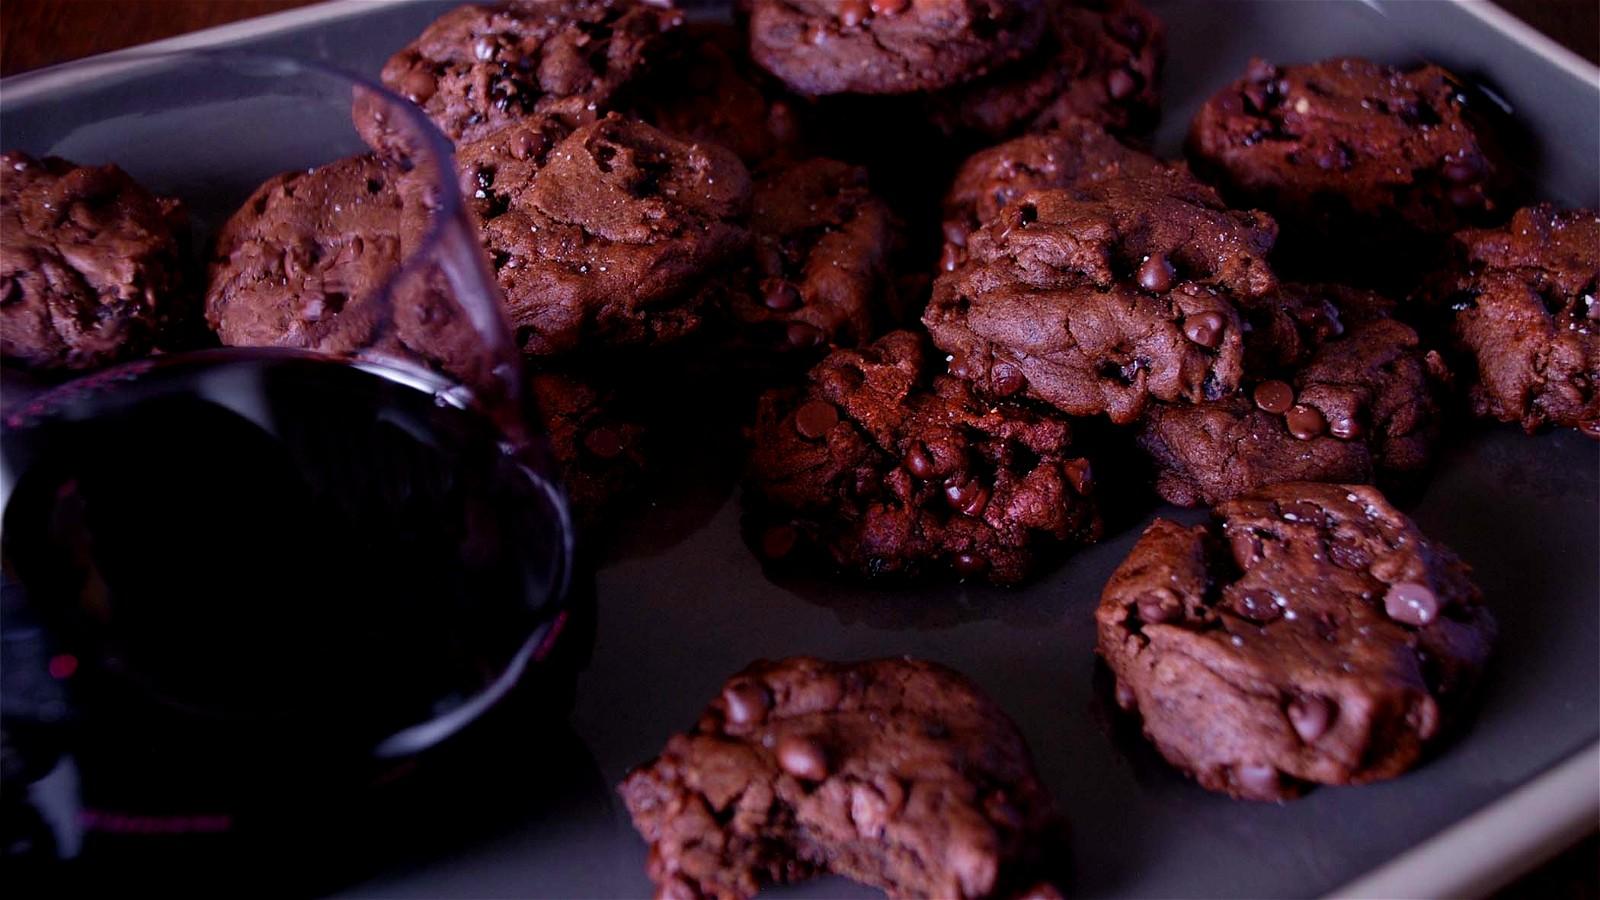 Image of Chocolate, Cherry, & Black Pepper Cookies